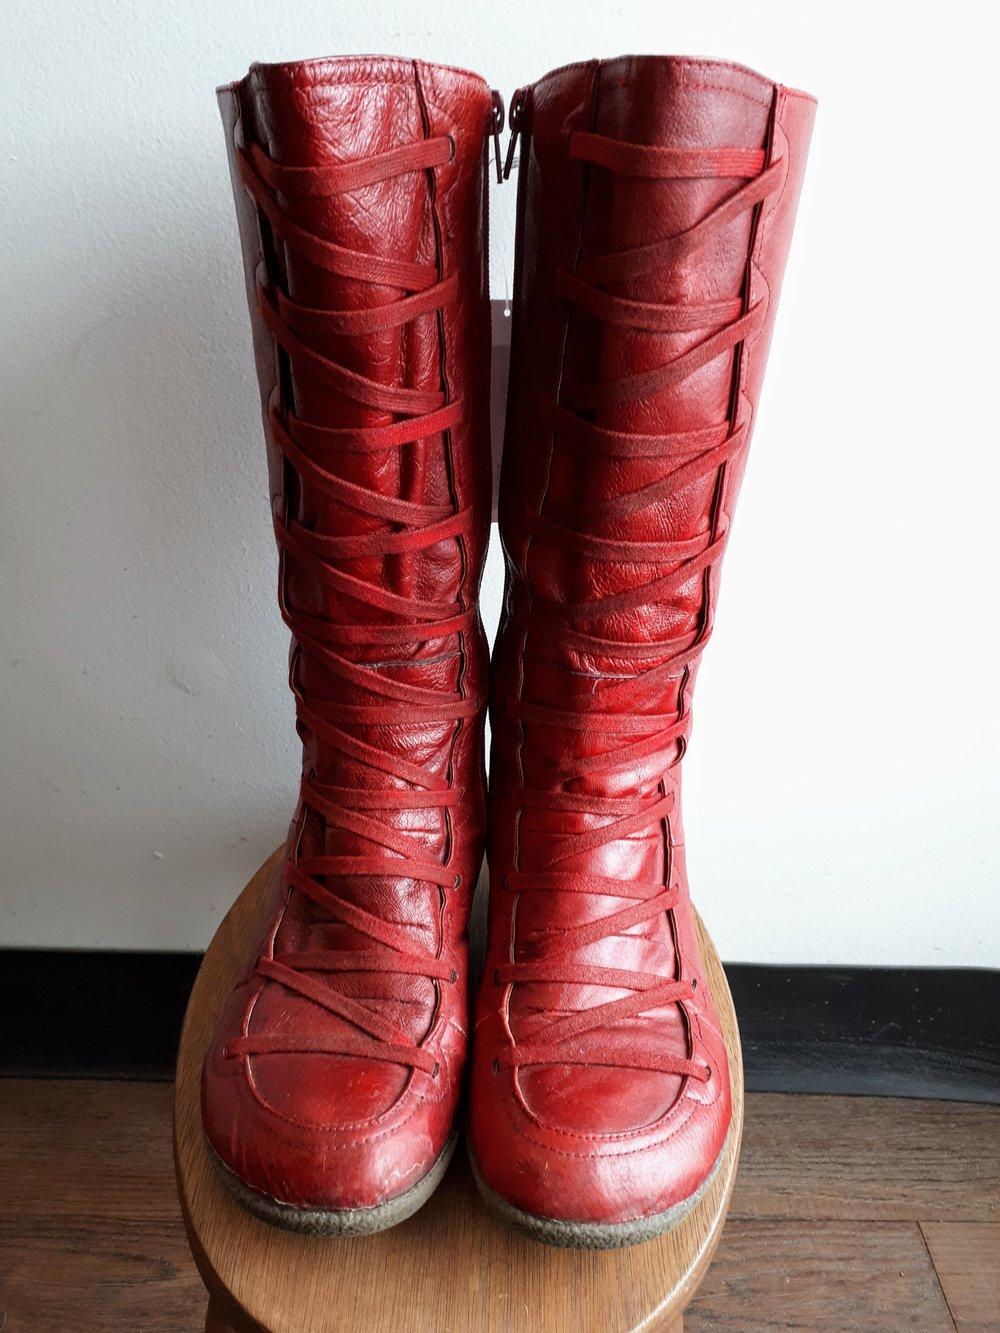 Miz Mooz boots; S7.5, $48